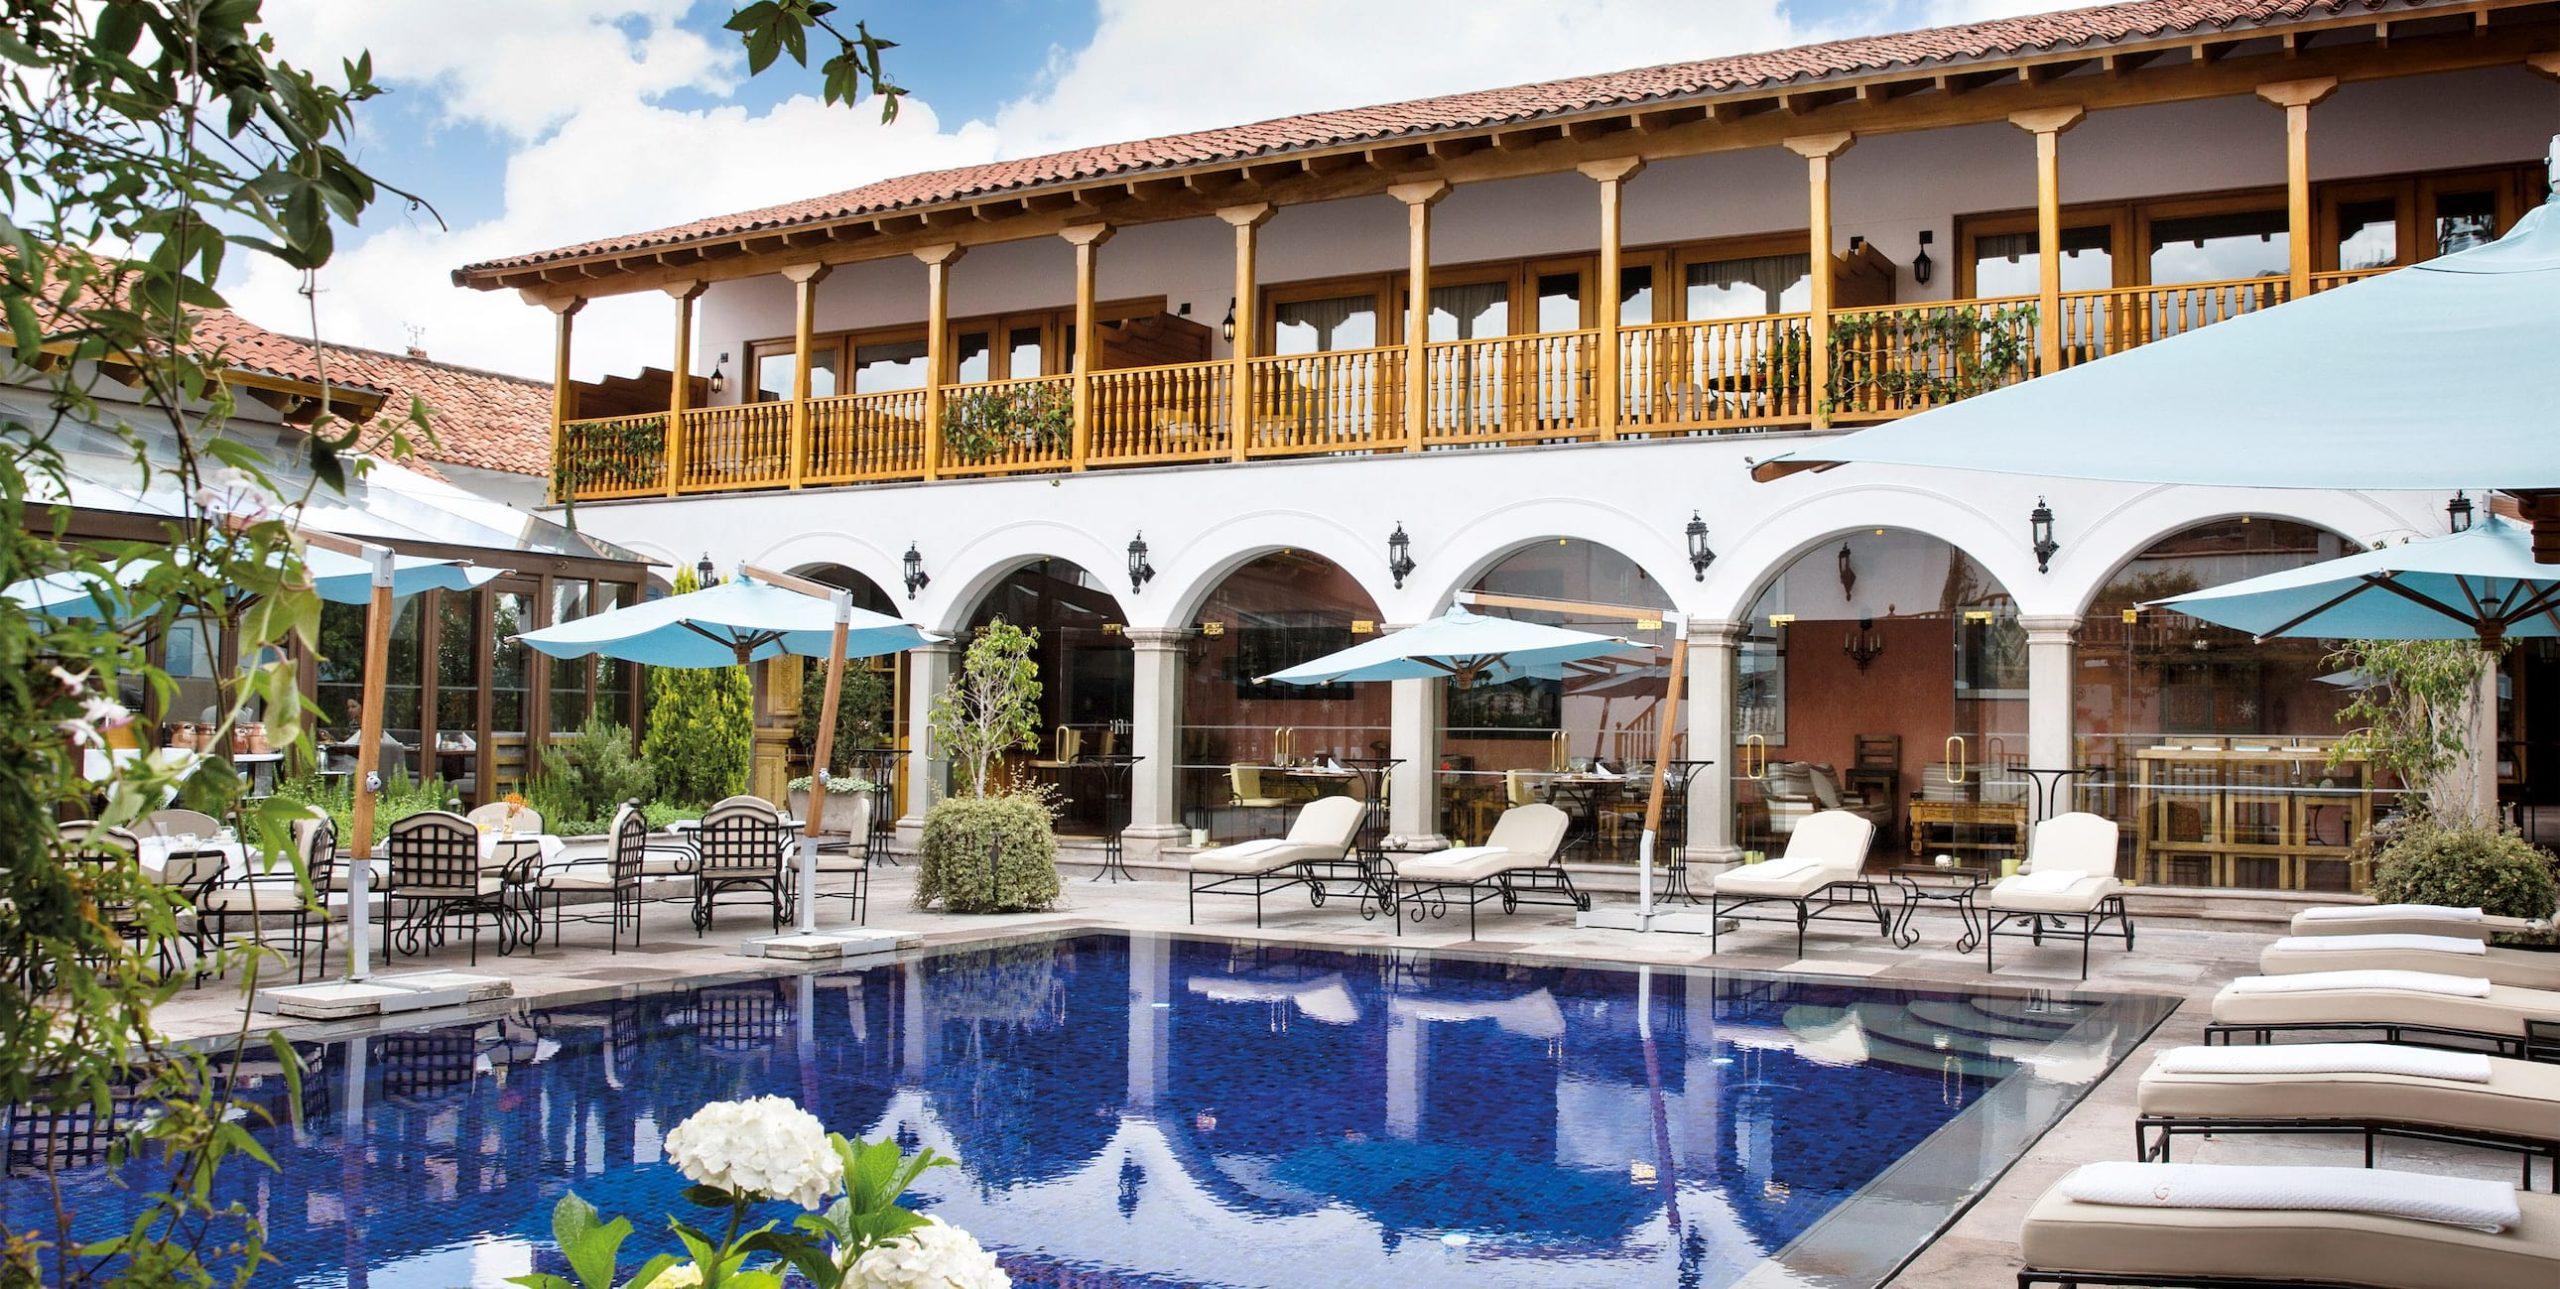 Belmond Palacio Nazarenas seen on Peru holiday